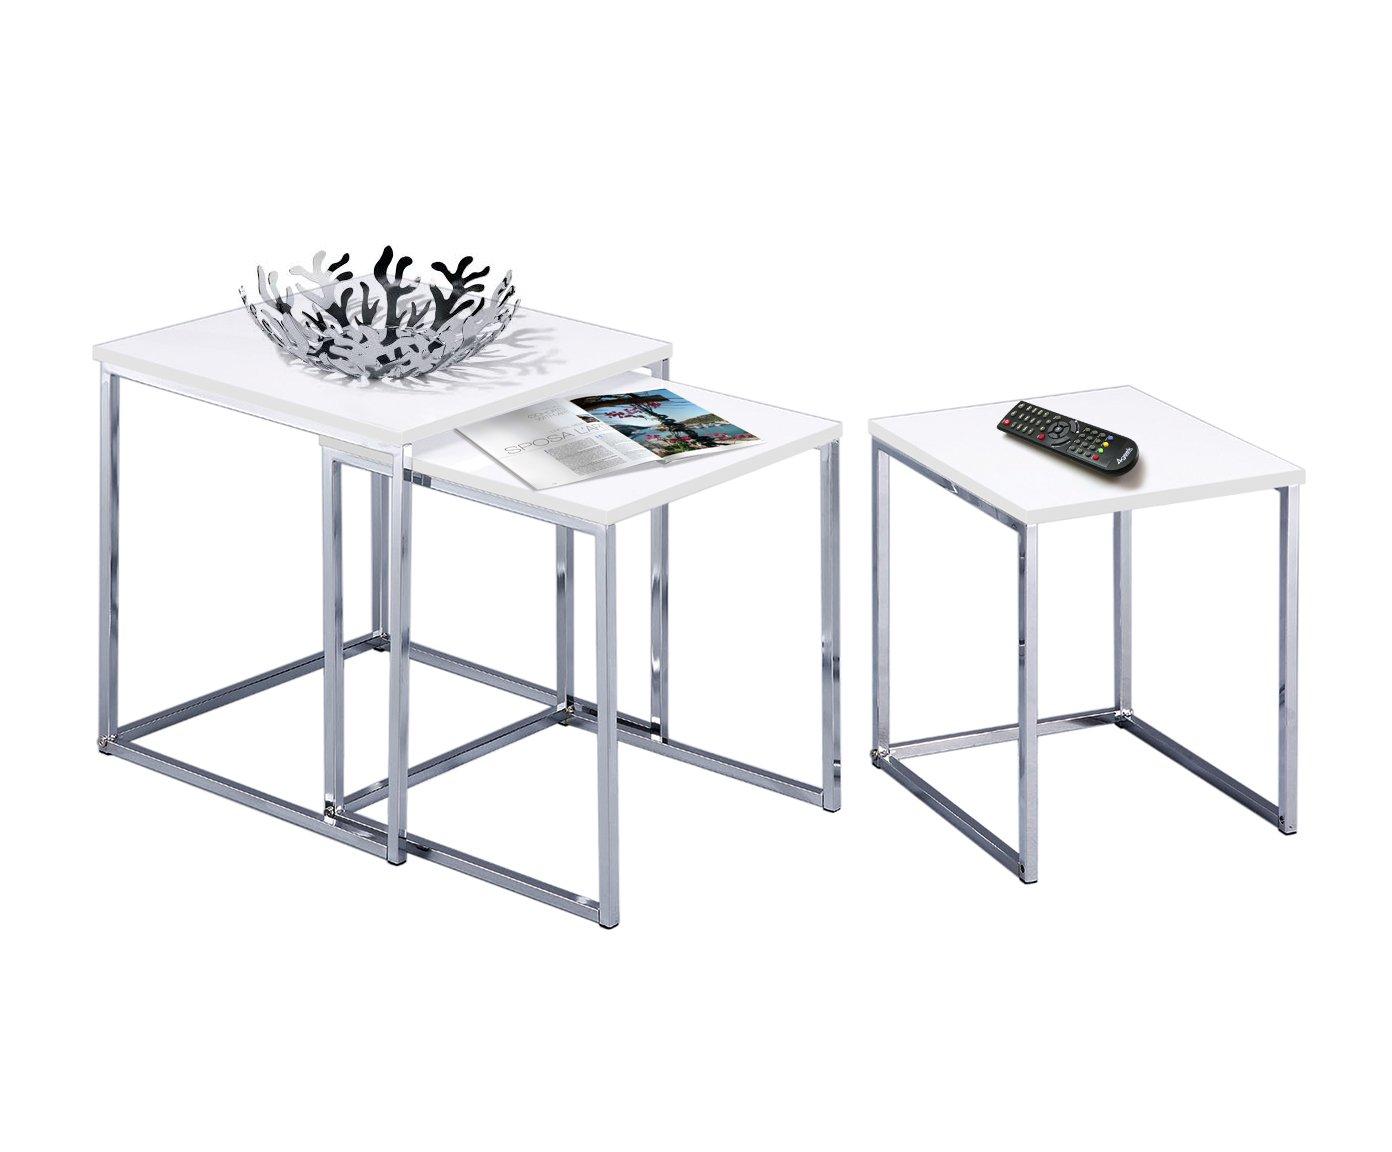 Esidra 9332-01 Set 3 Tavolini, Acciaio Cromato, Bianco, 40x40x42 cm Evergreen House